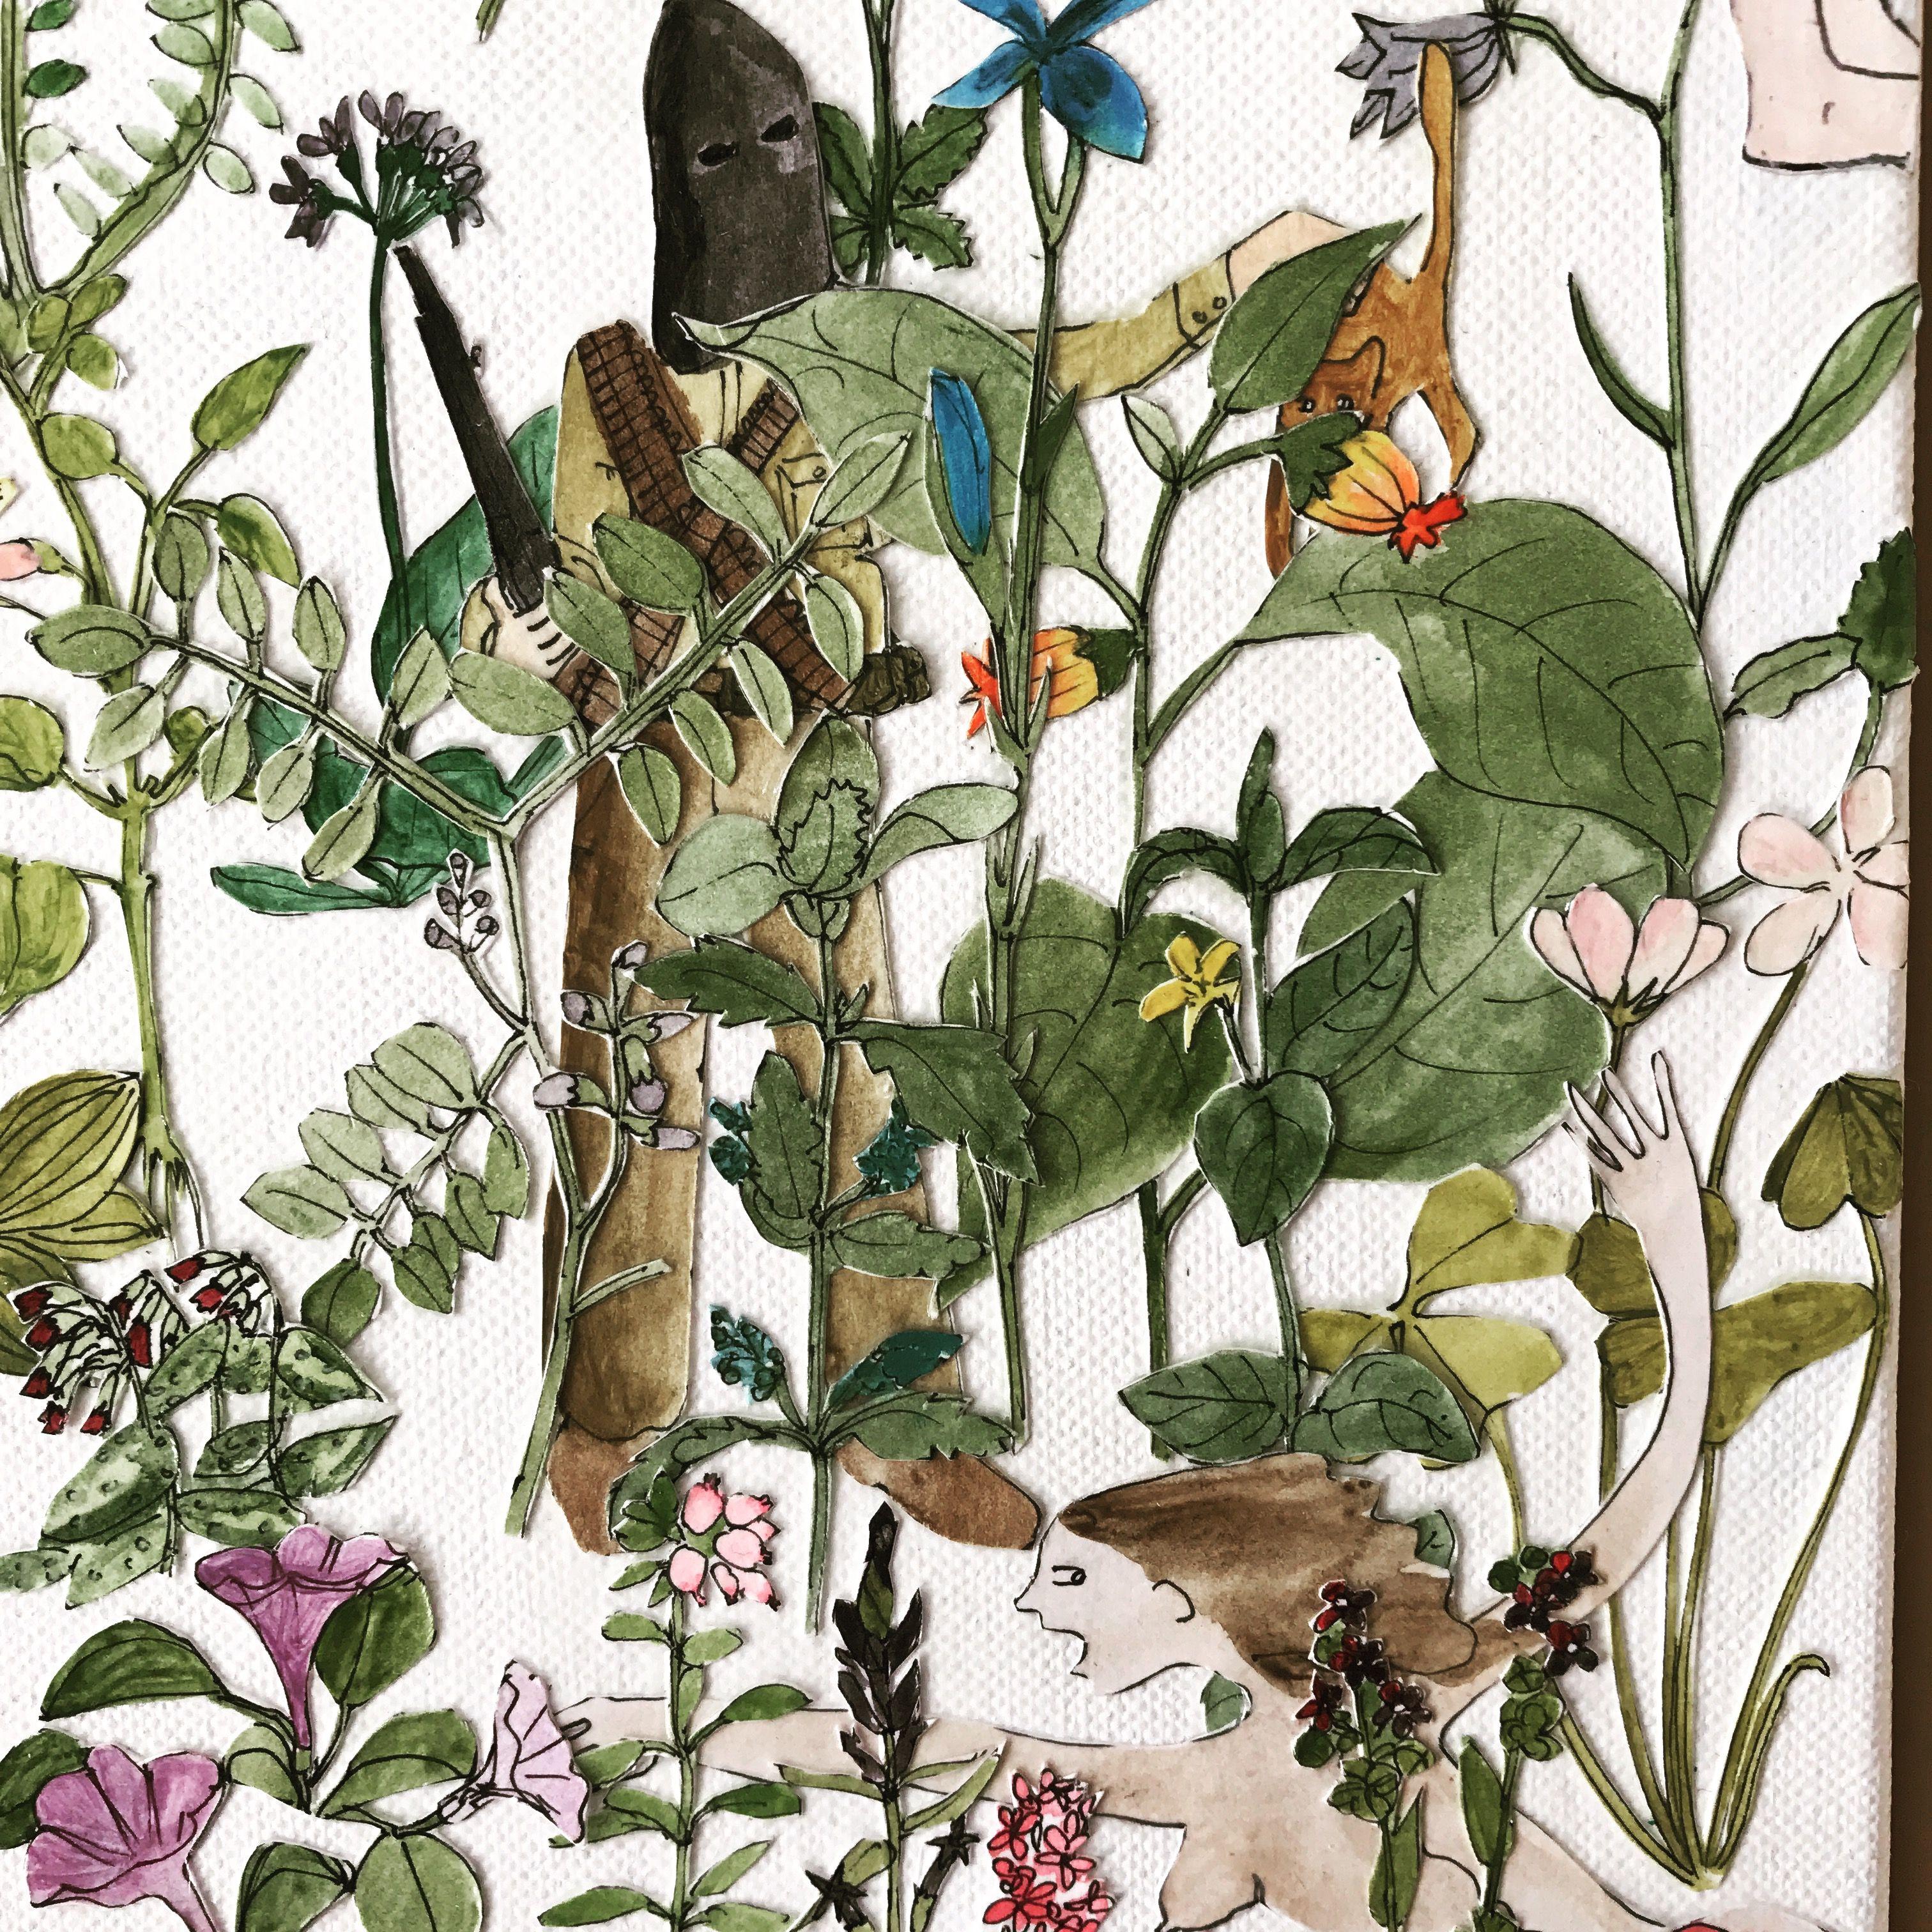 Detail 'in the garden' by Anna Surie www.annasurie.com www.nlxl.com